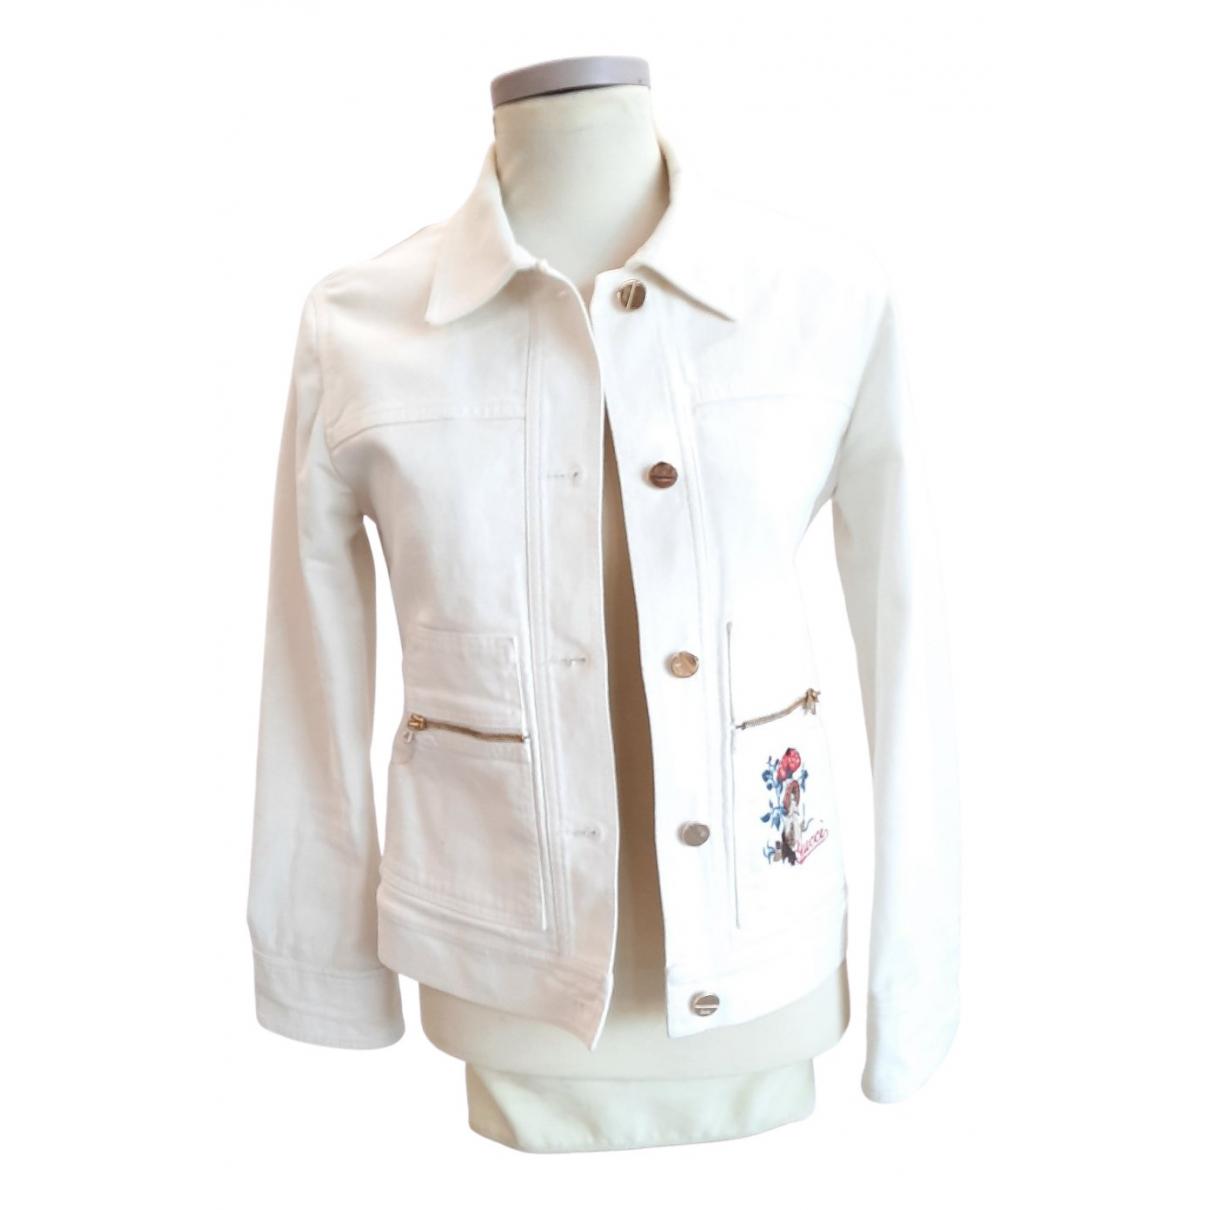 Gucci \N White Denim - Jeans jacket for Women 44 IT